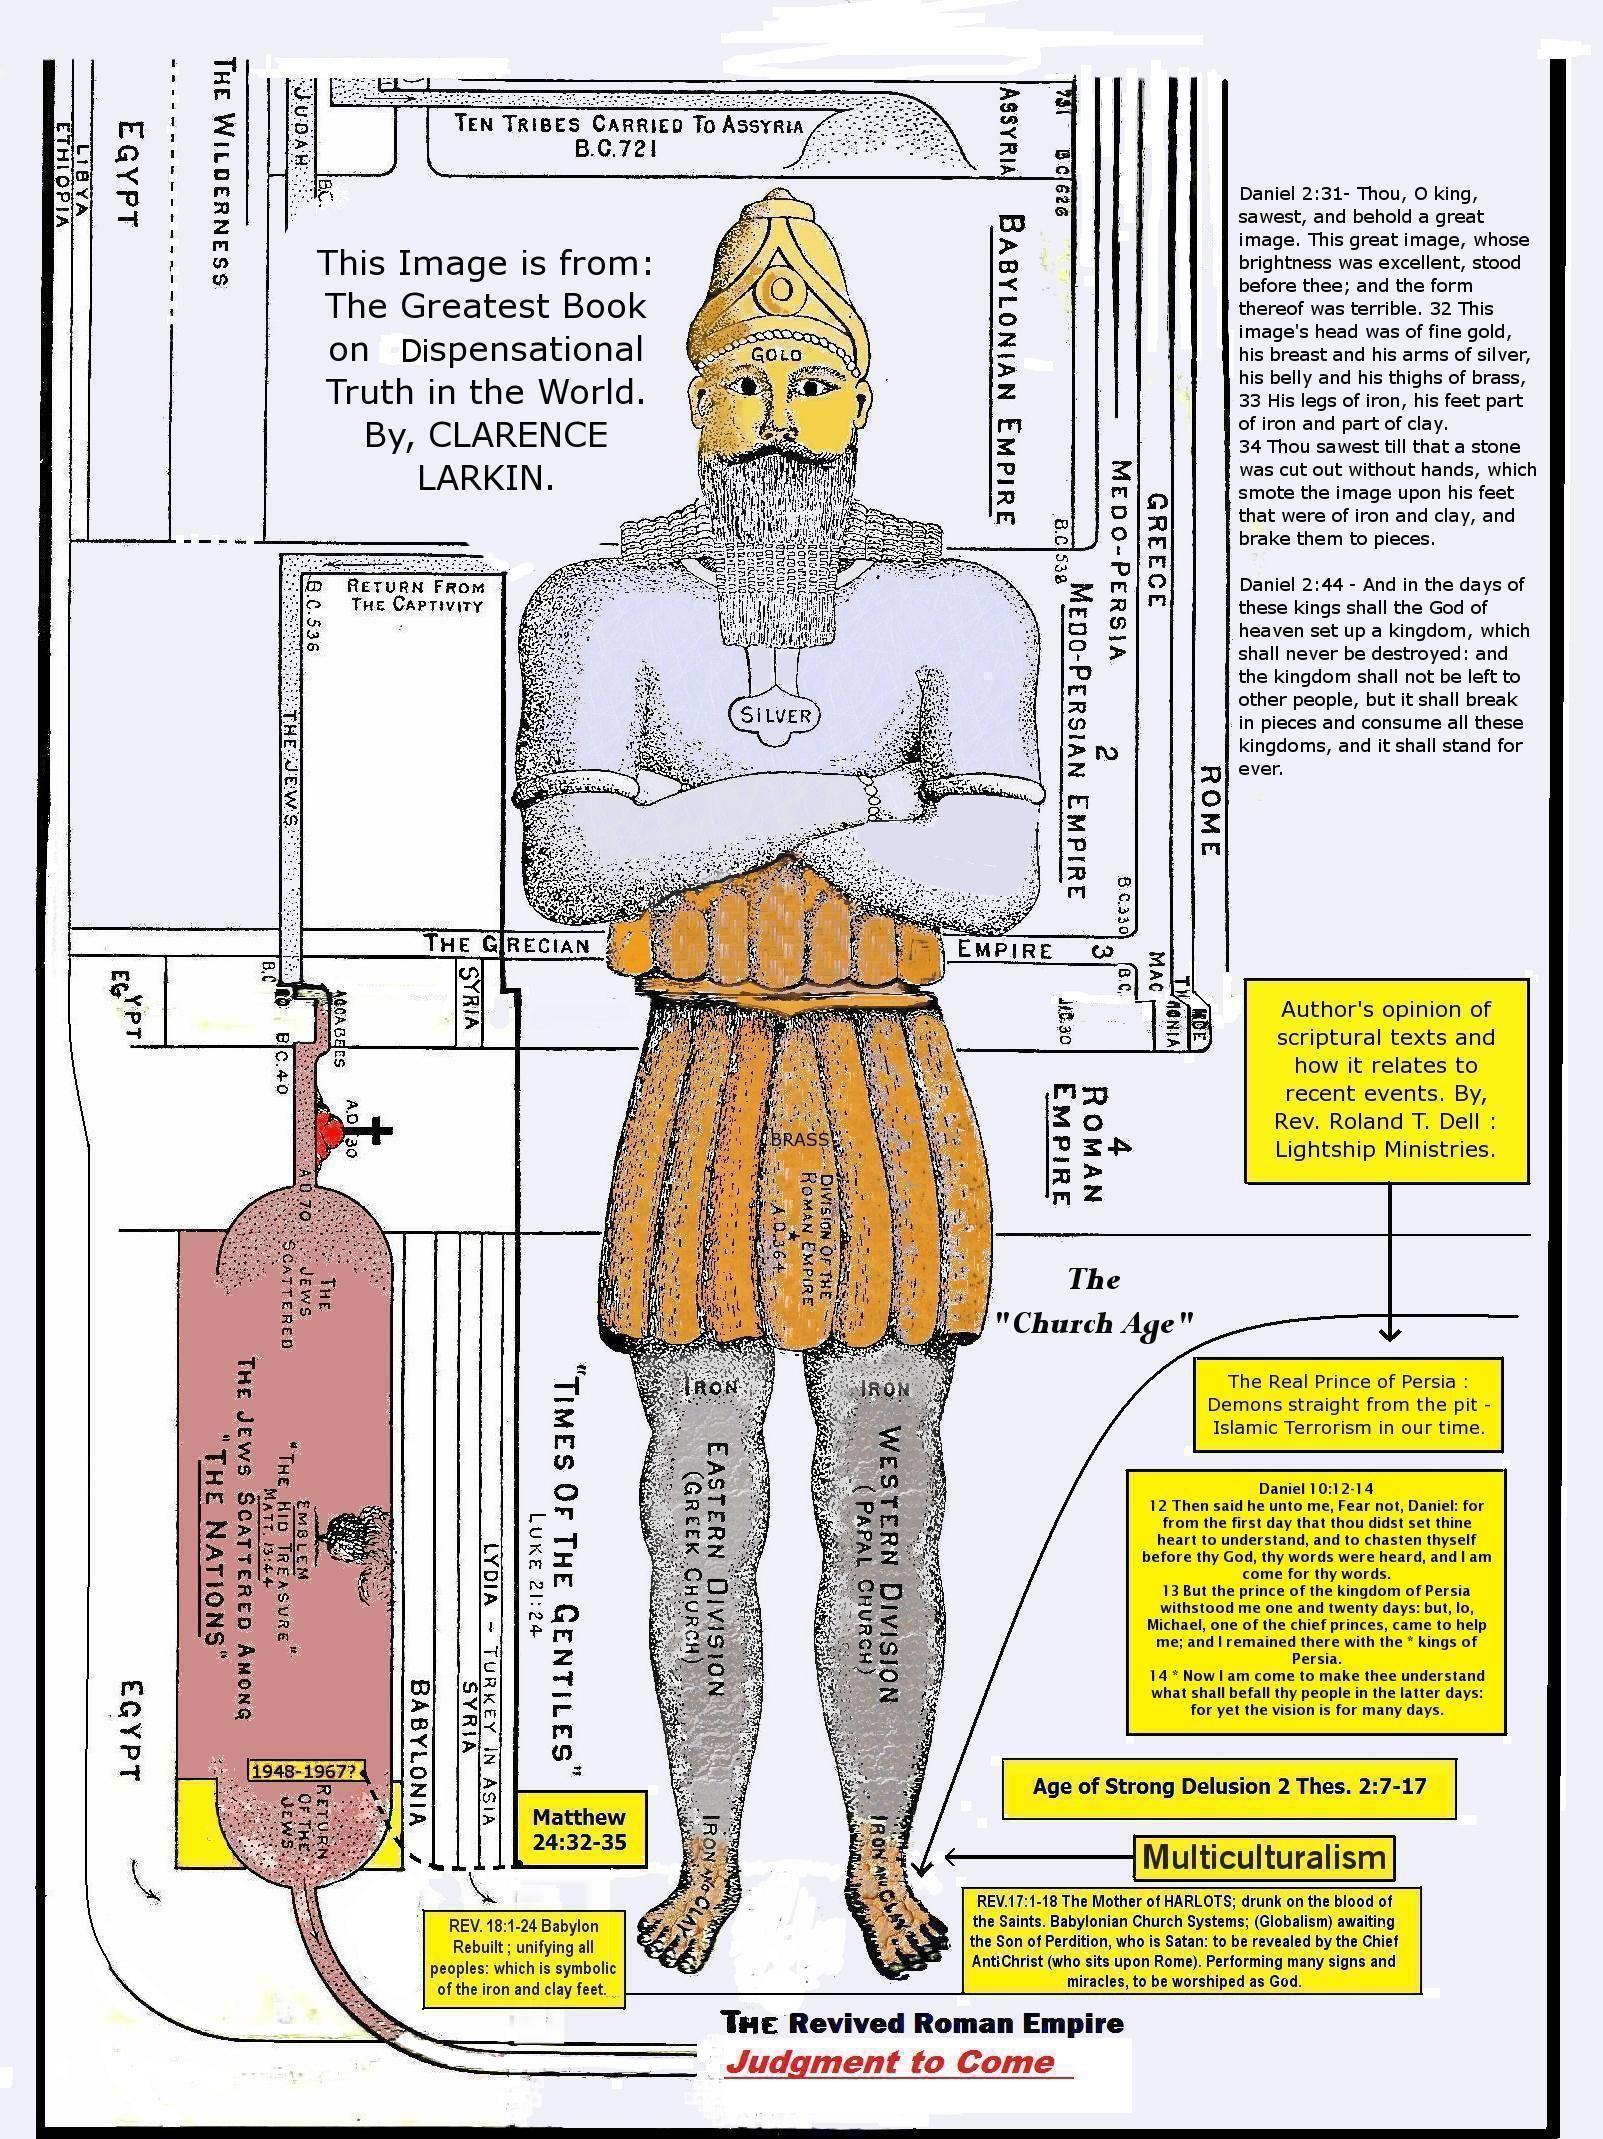 History of book of daniel